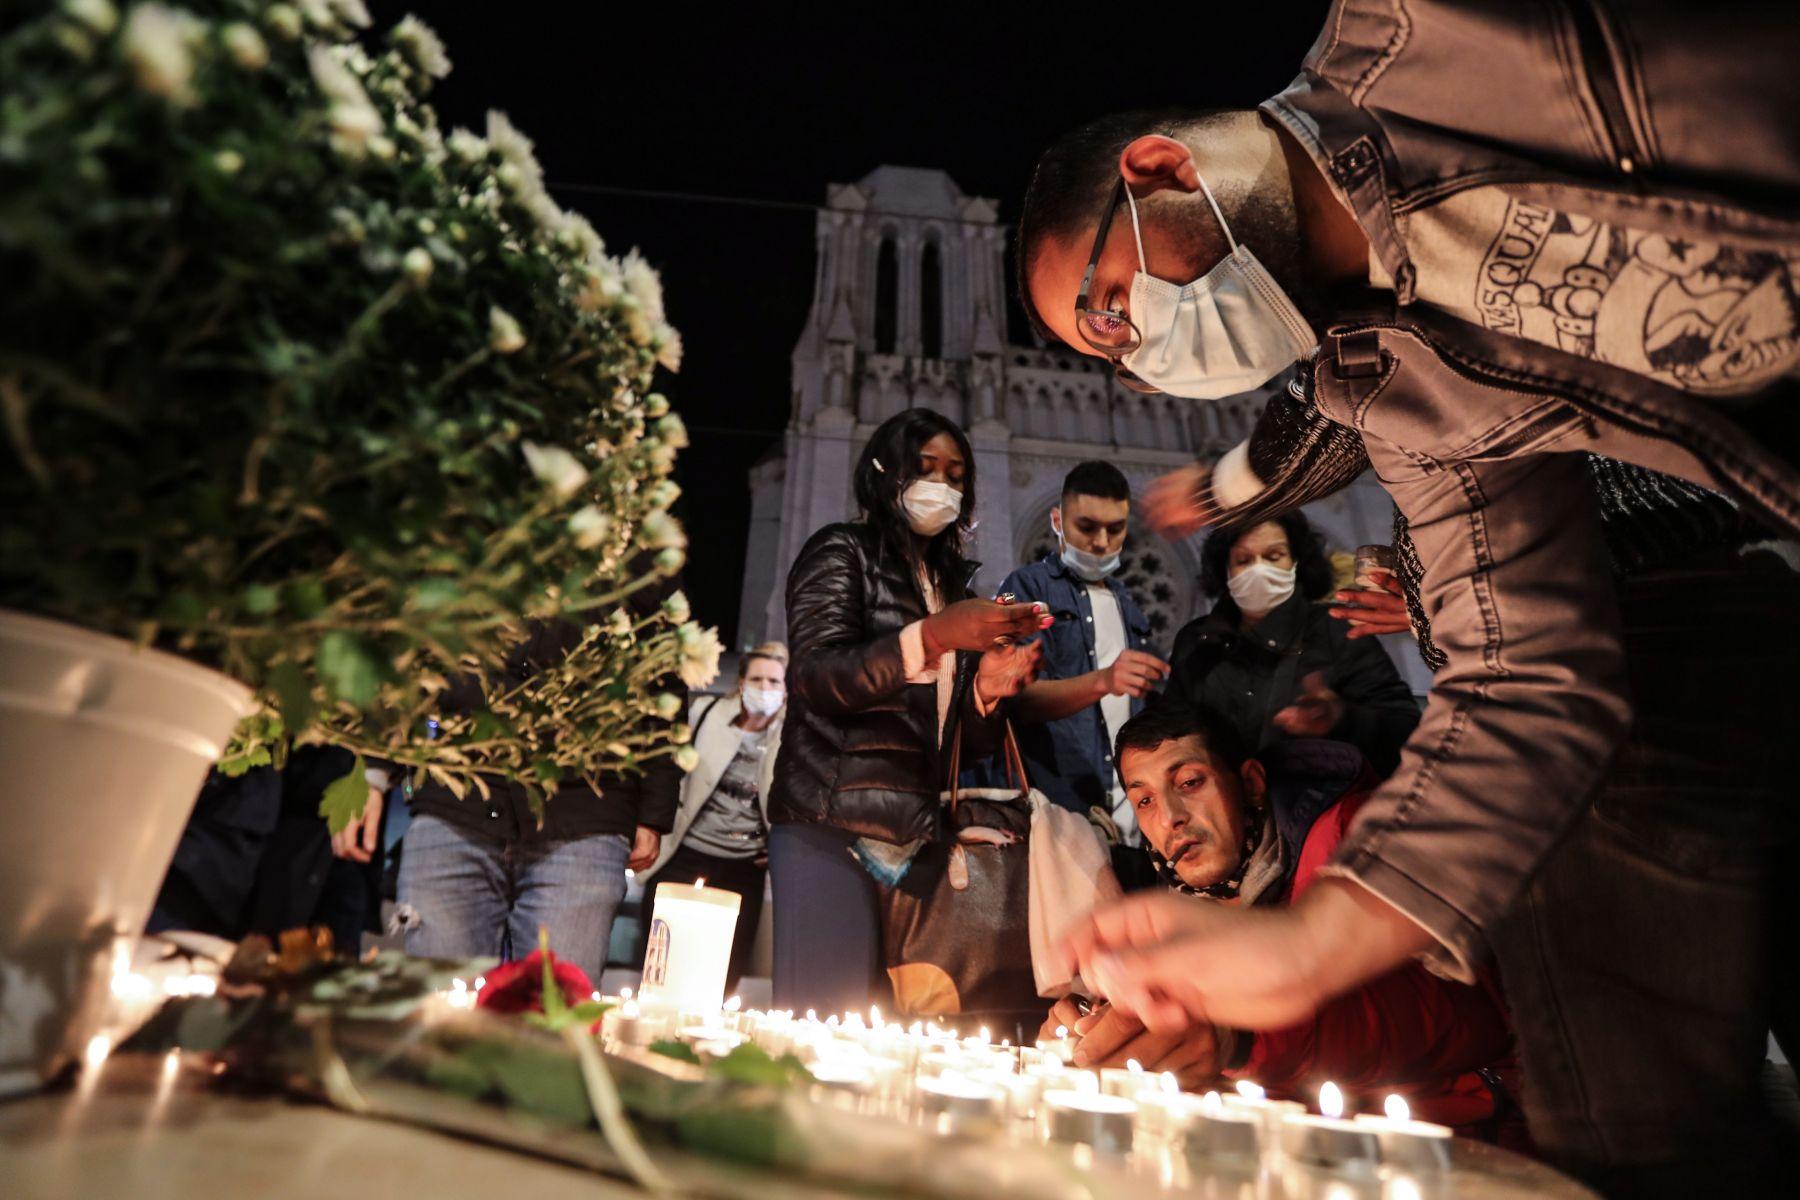 AFP/Valery Hache